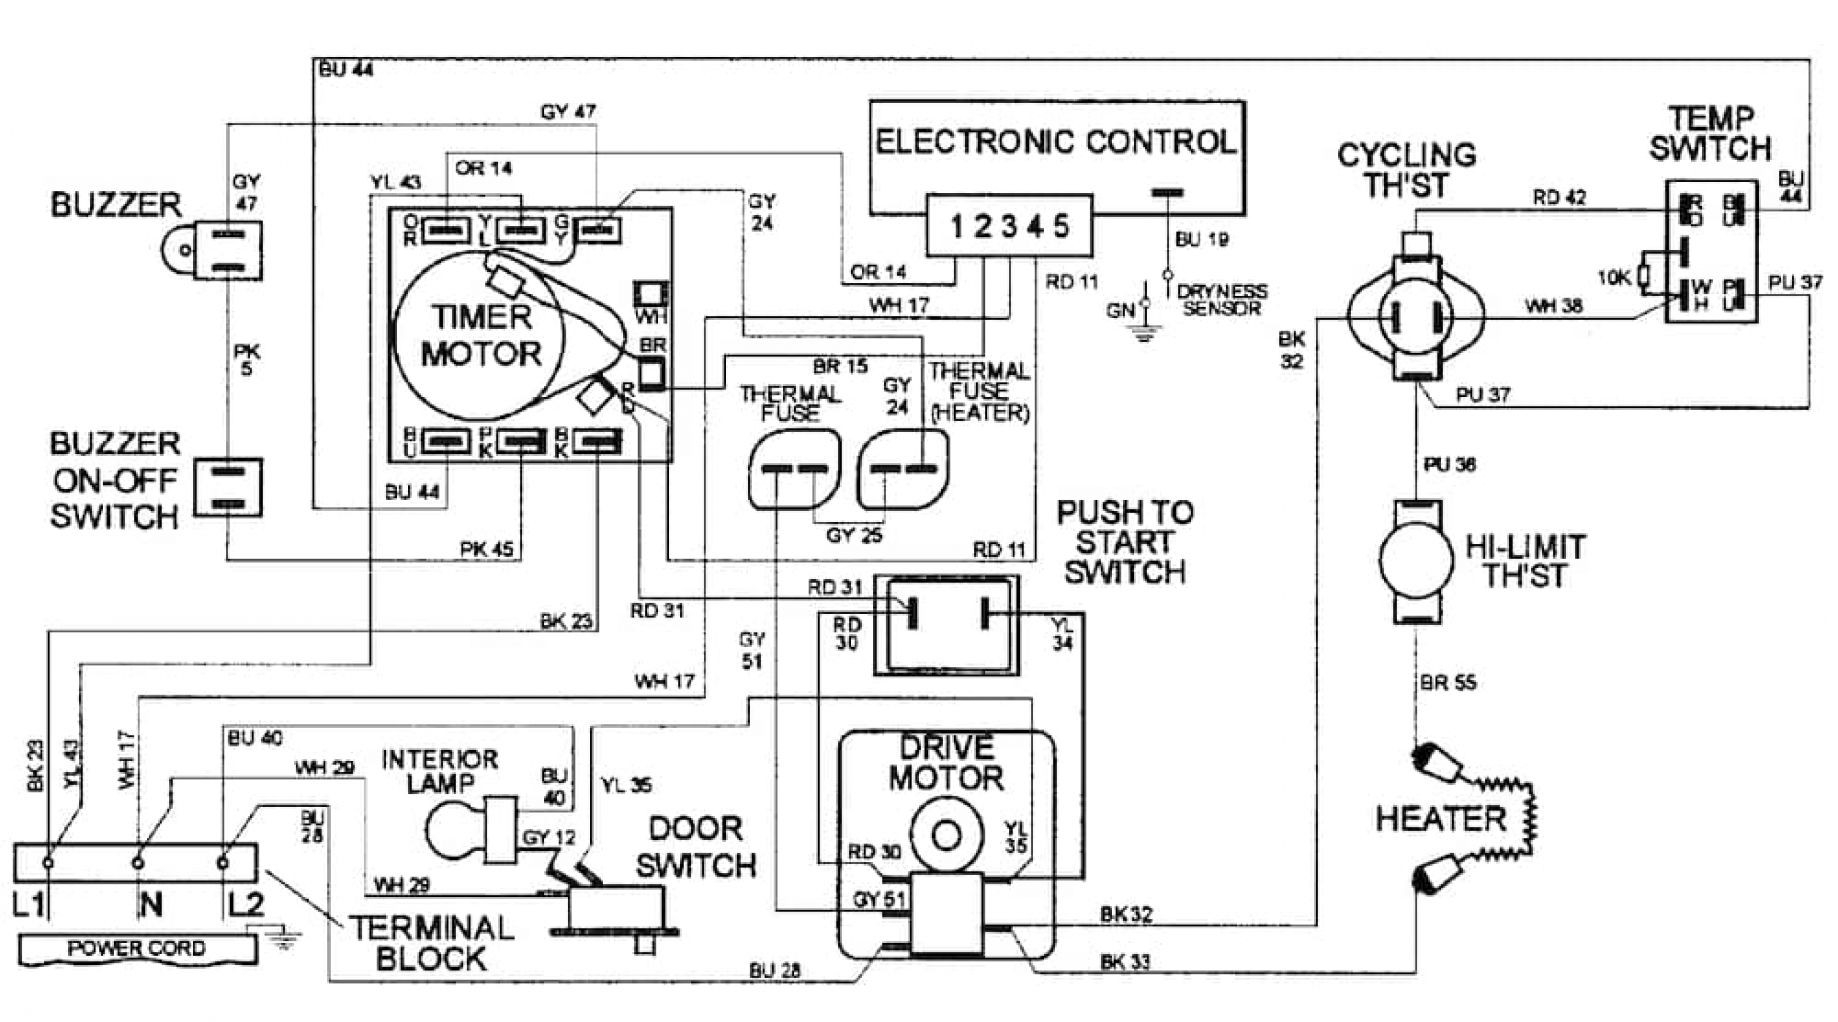 5 wire dryer wiring diagram read all wiring diagram Wiring a 3 Wire Dryer to a 4 Wire Plug